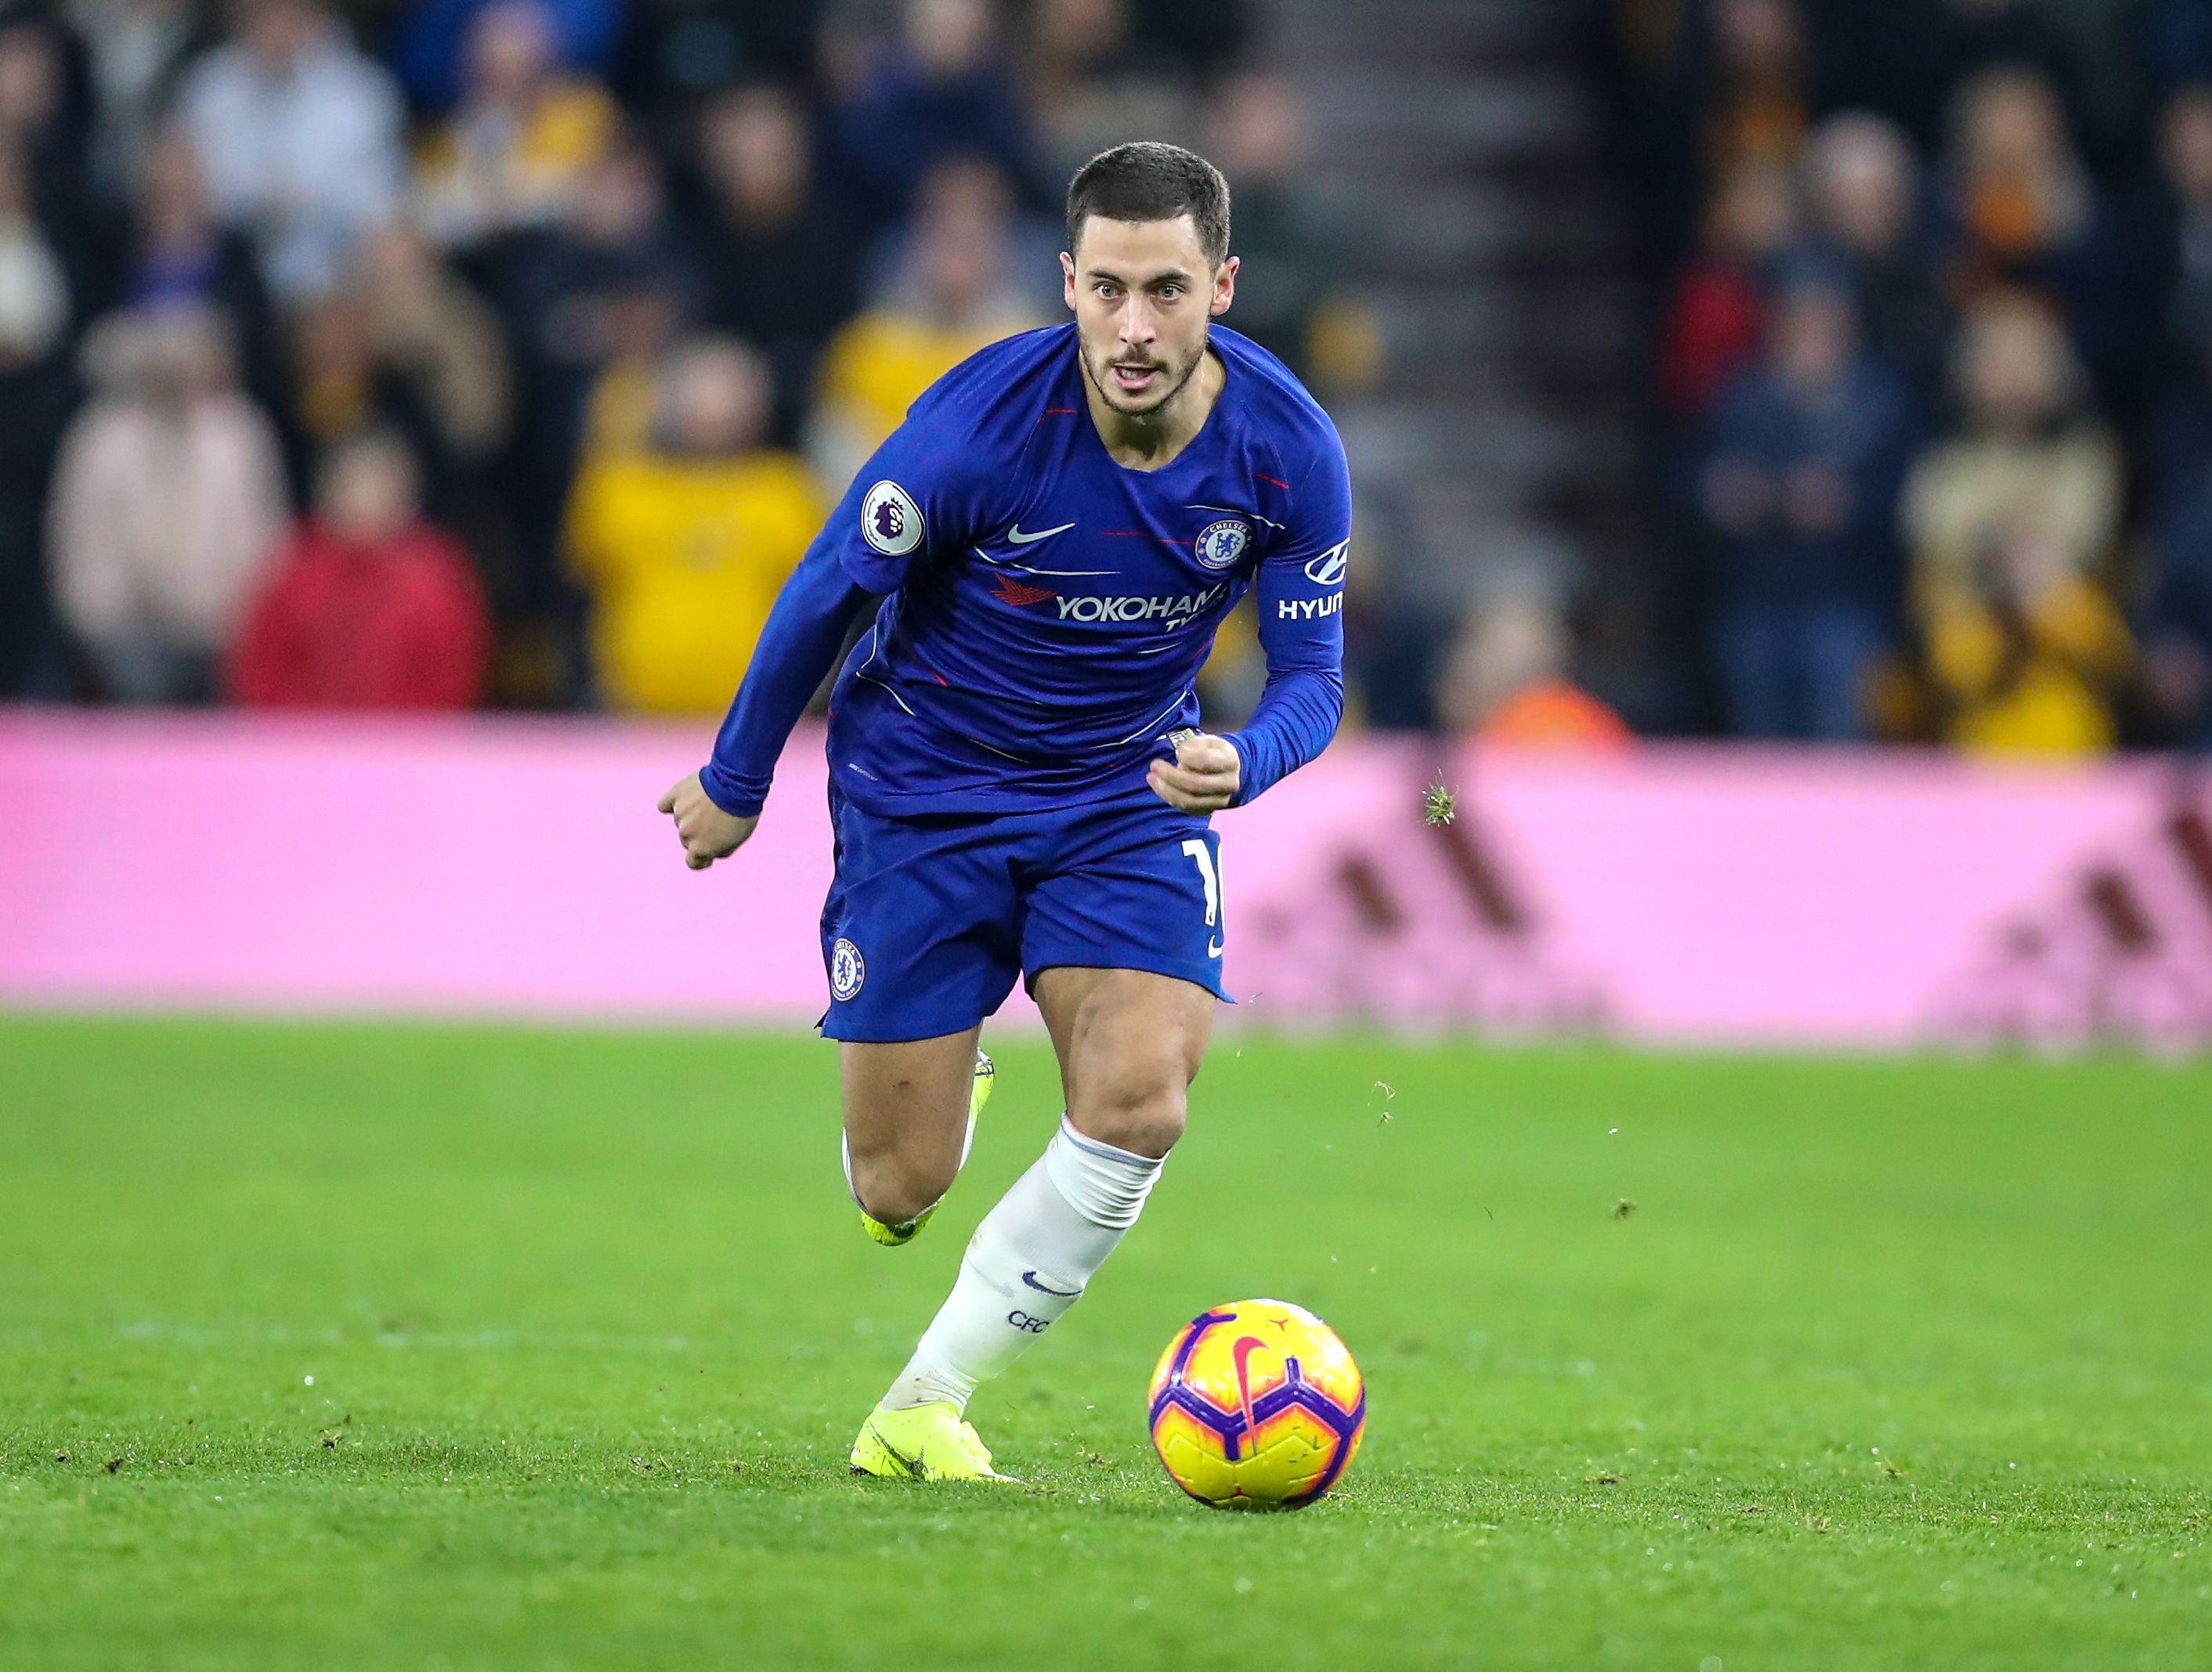 Football - Etranger - Premier League : Everton-Chelsea en direct